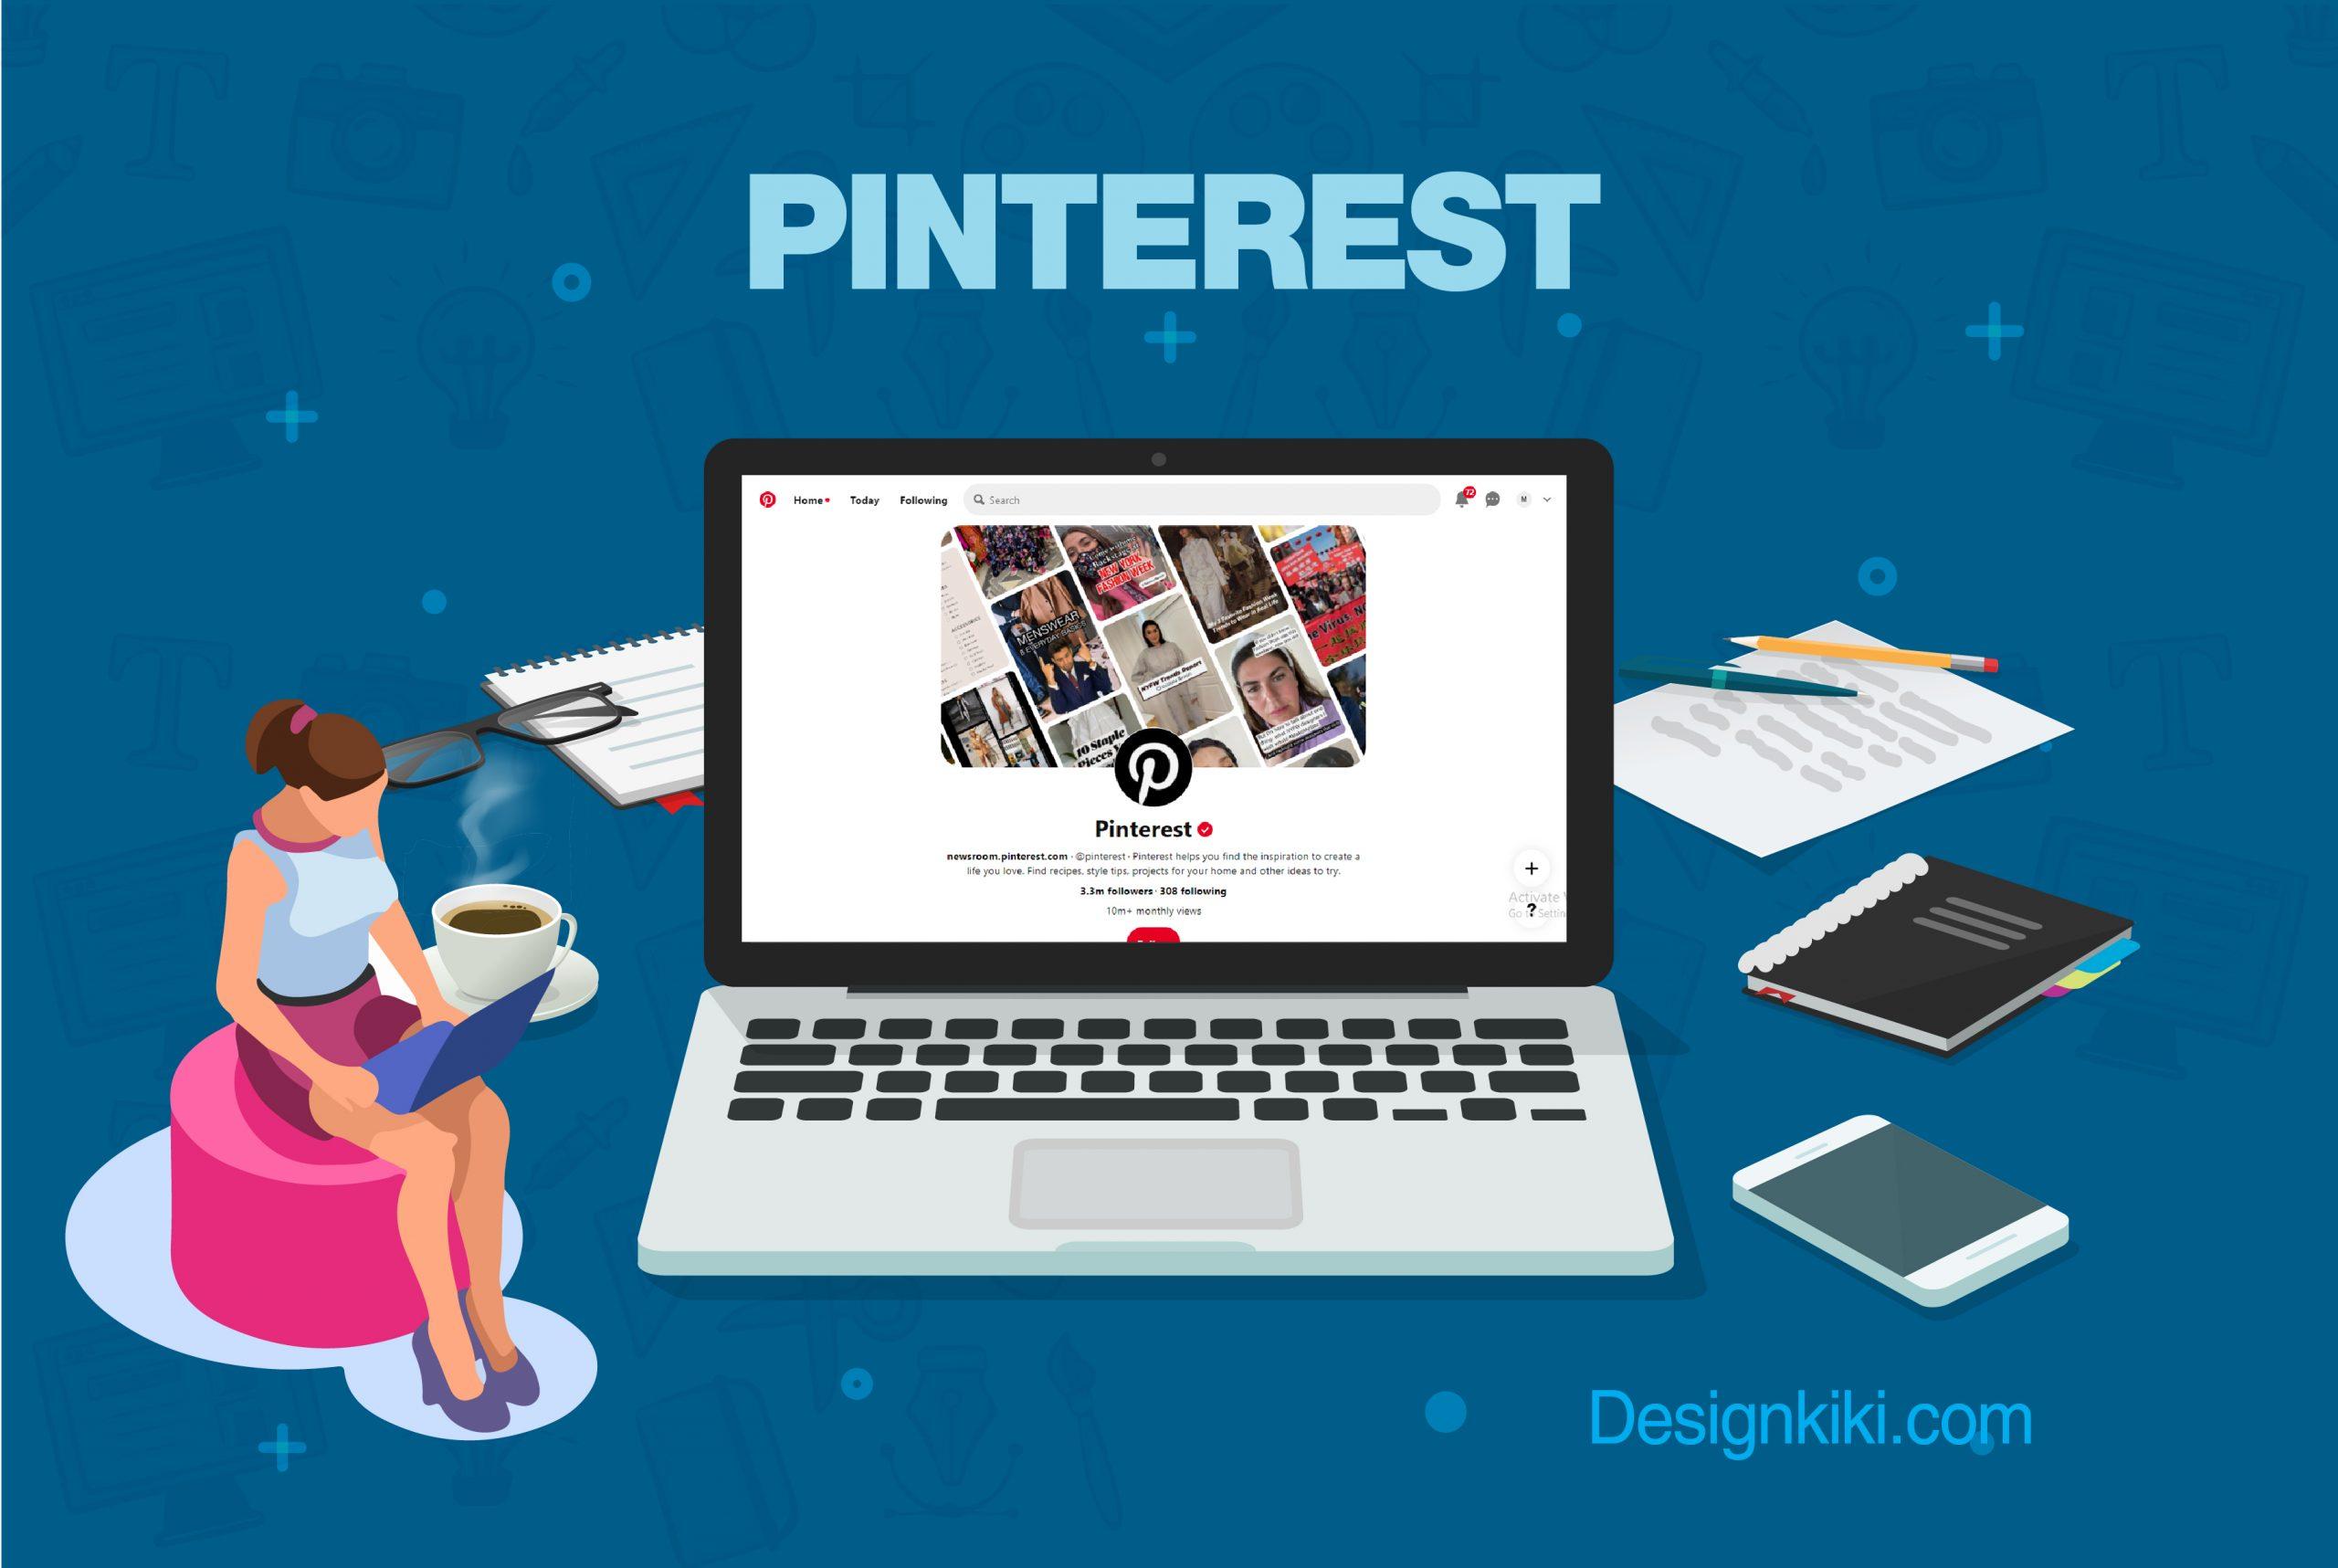 Website design inspiration on Pinterest